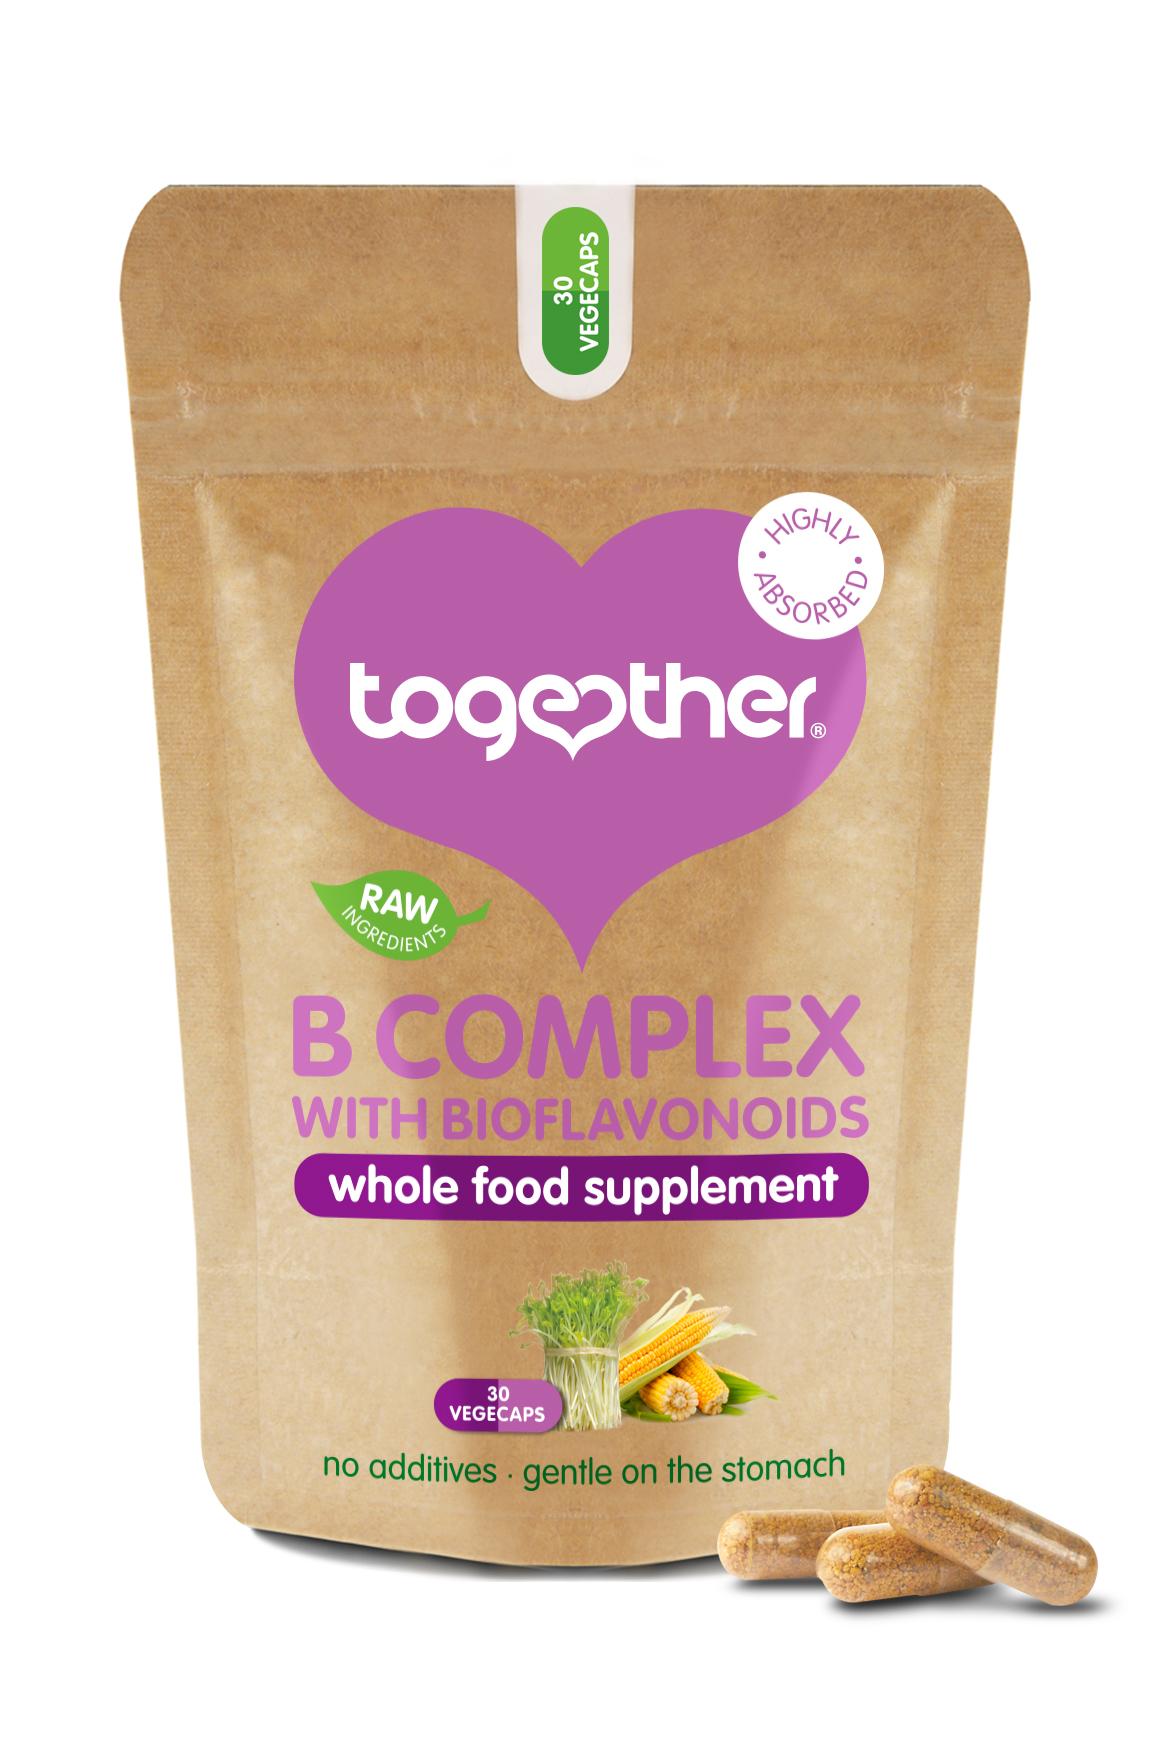 B Complex with Bioflavonoids 30's